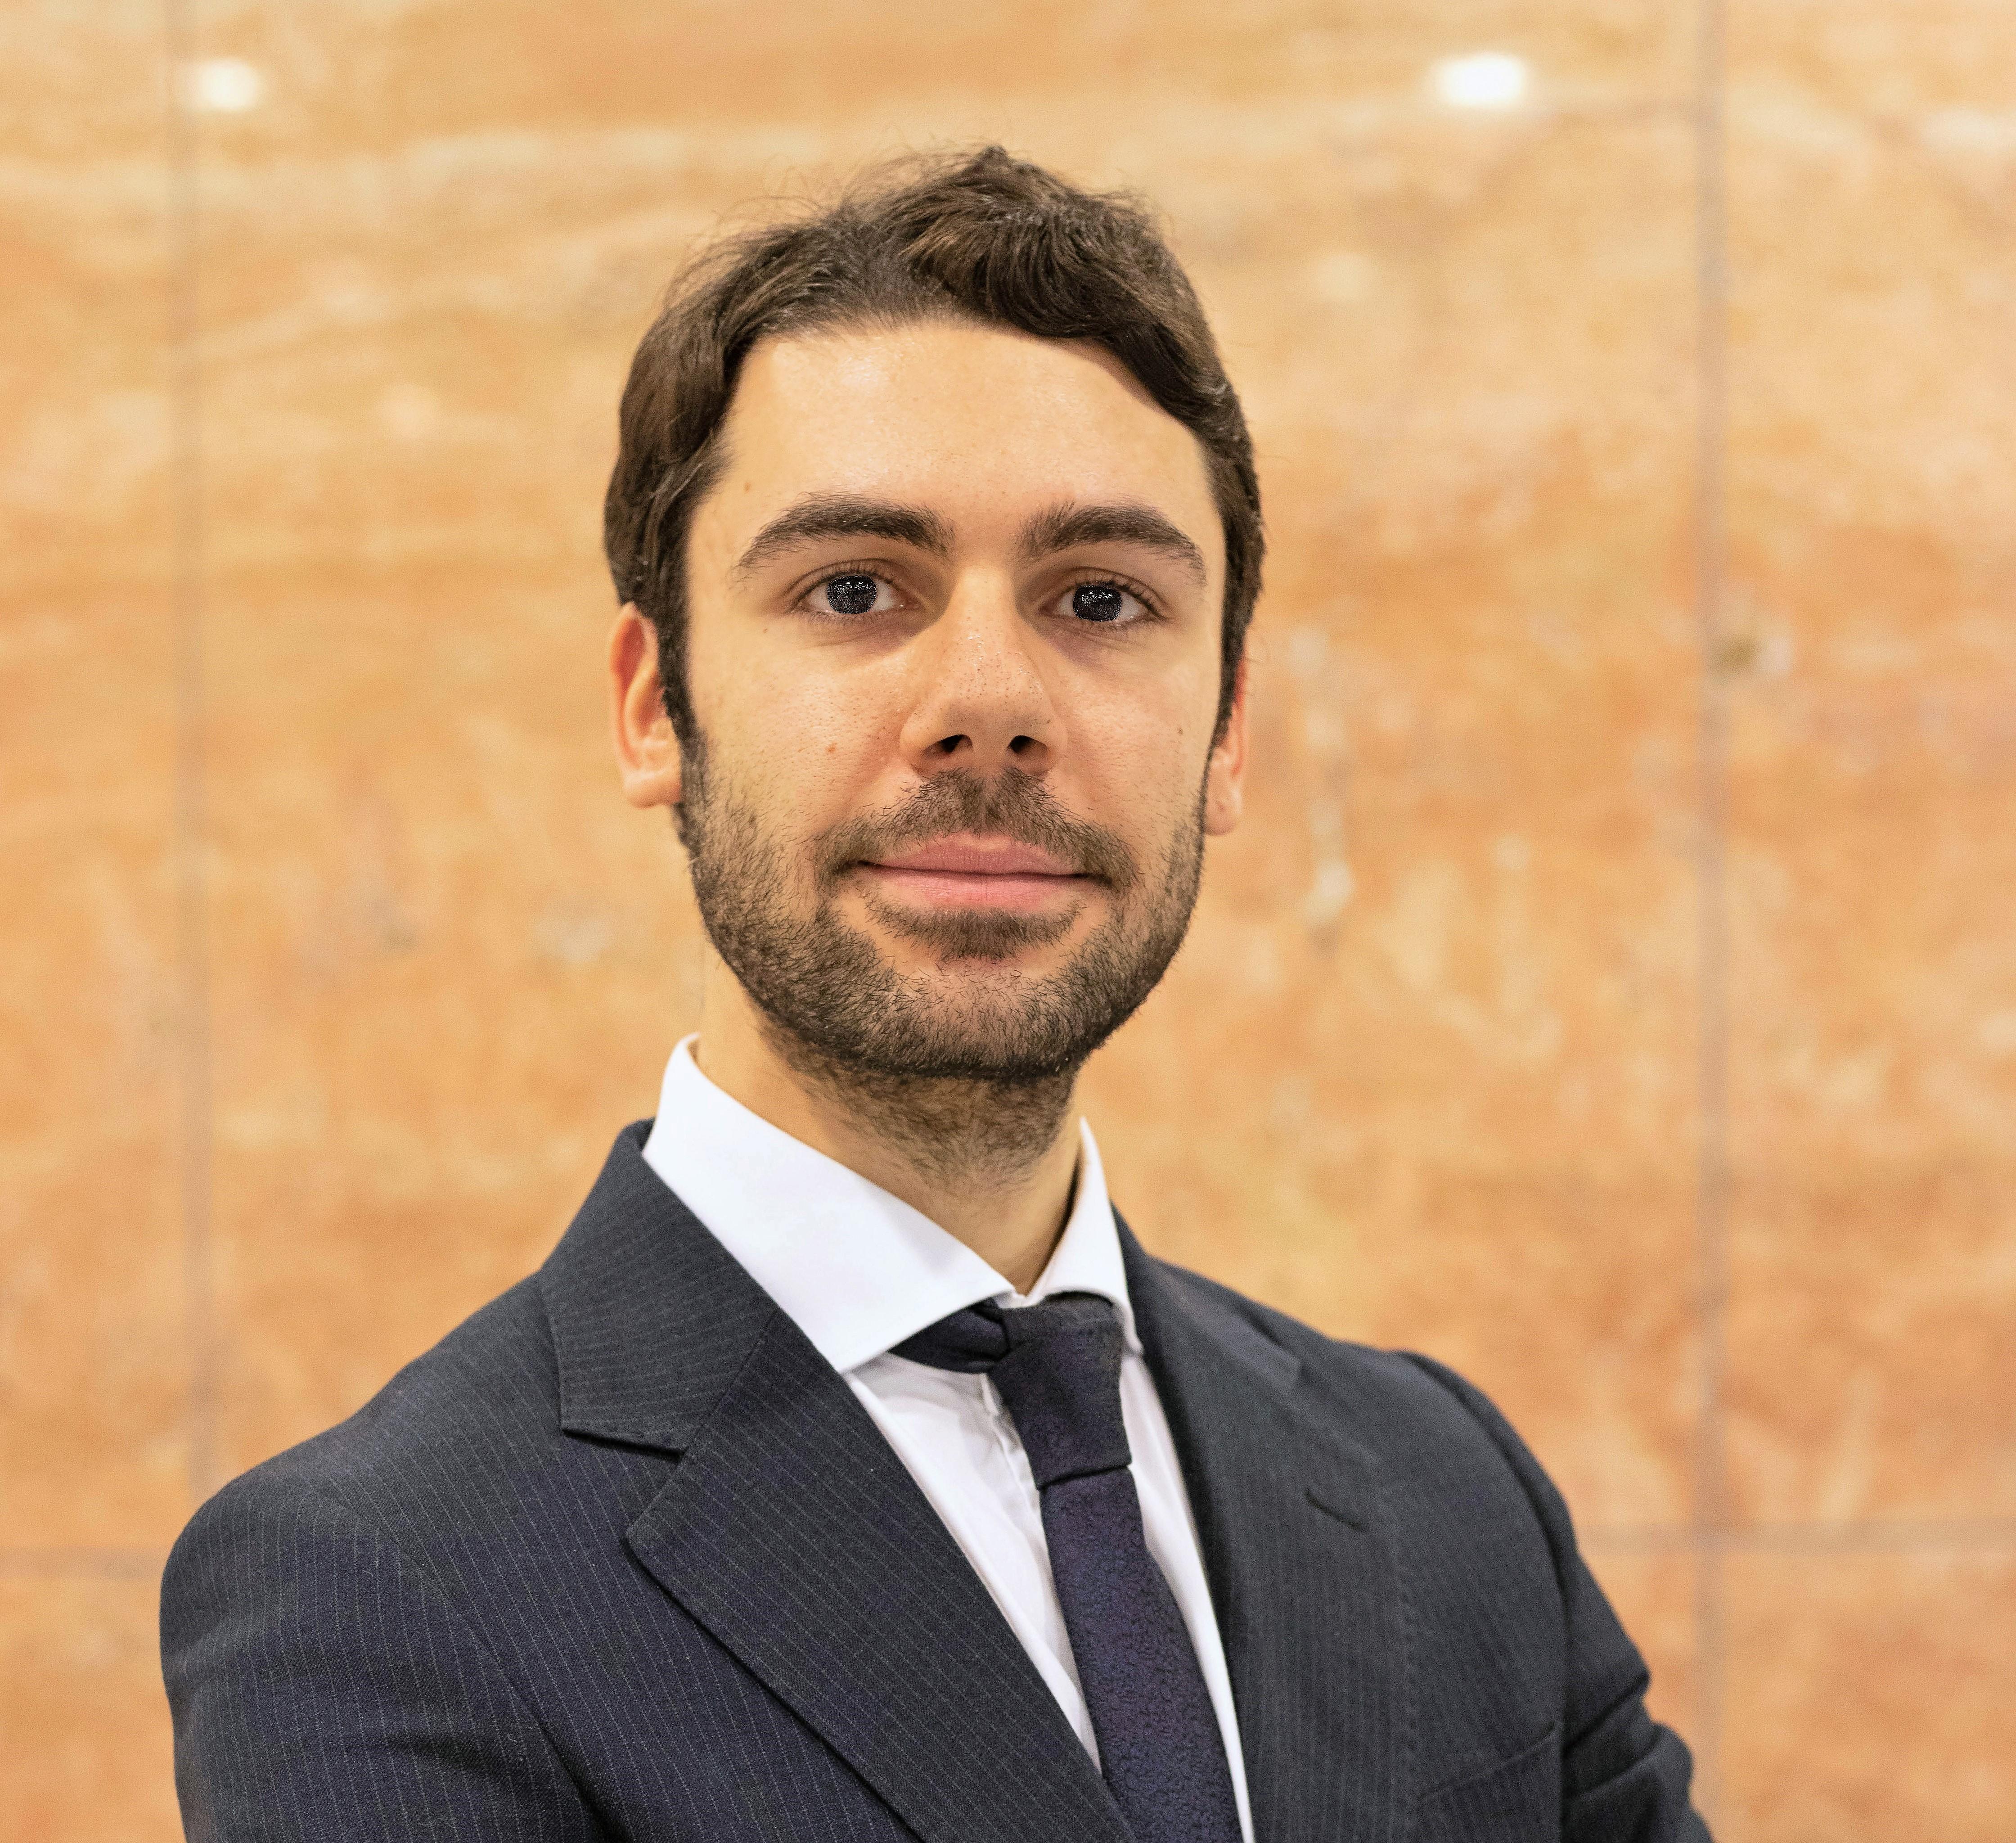 Daniele Perrone